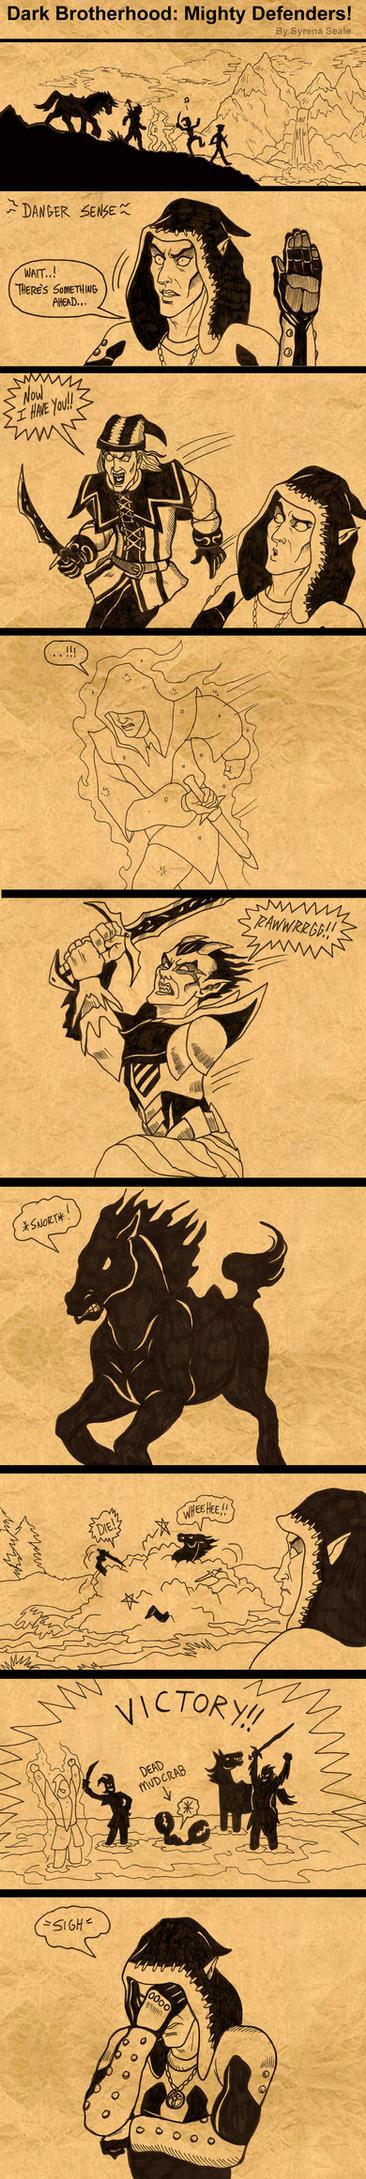 Dark Brotherhood Mighty Defenders by SlayerSyrena